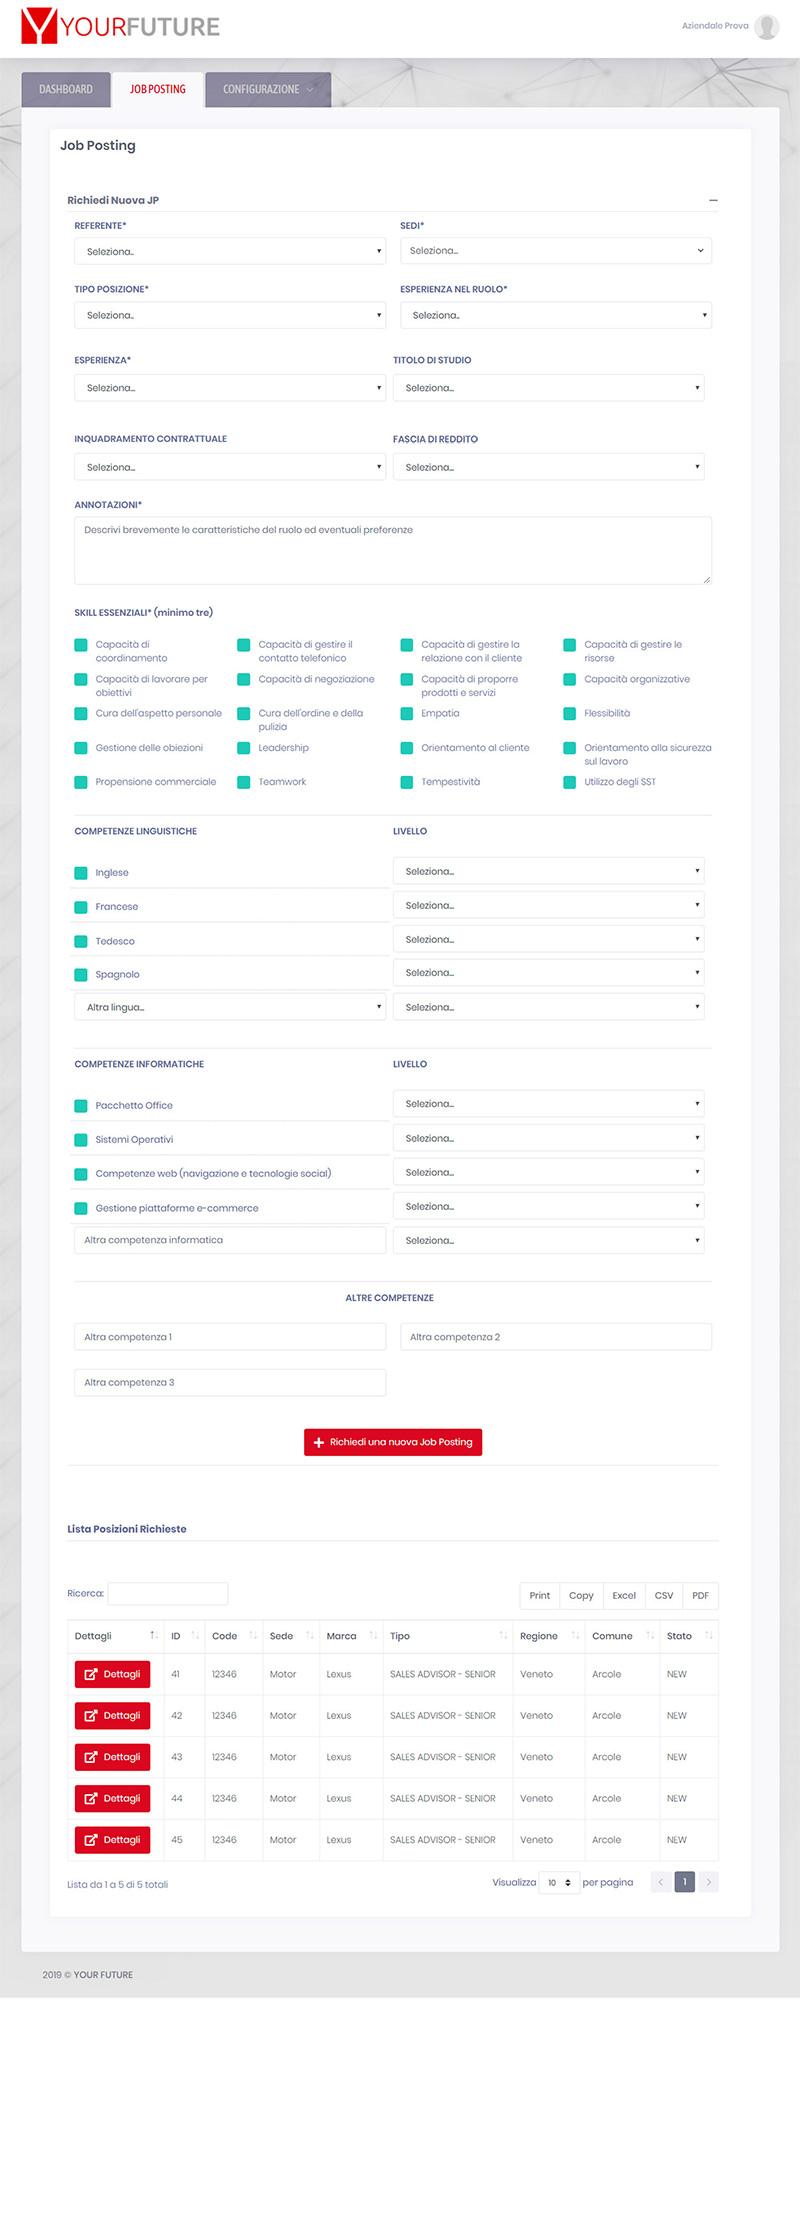 yourfuture.careers aziendale - portfolio app arsdue